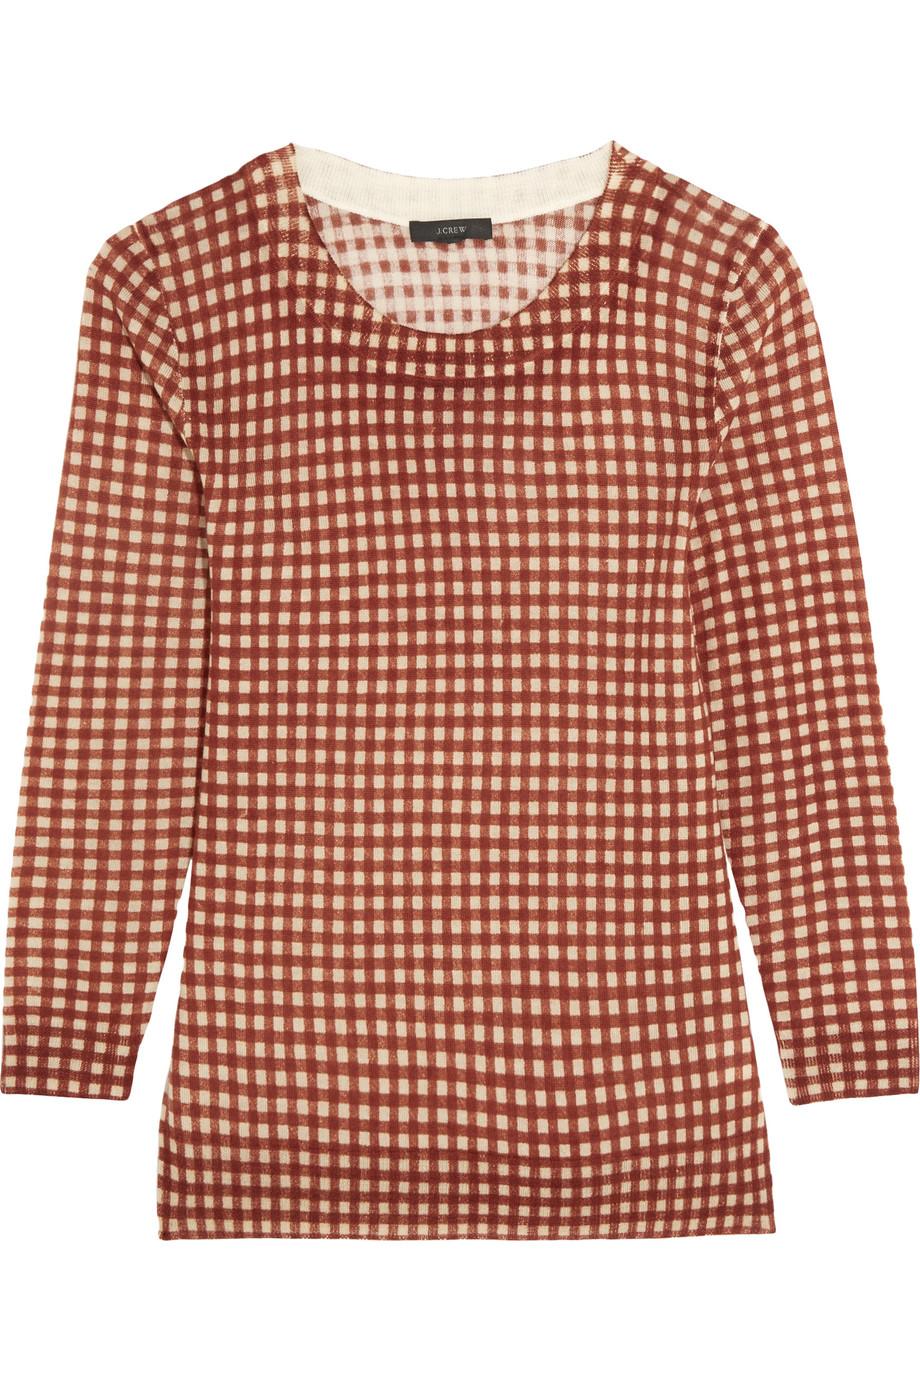 J.Crew Tippi Gingham Merino Wool Sweater, Size: XL